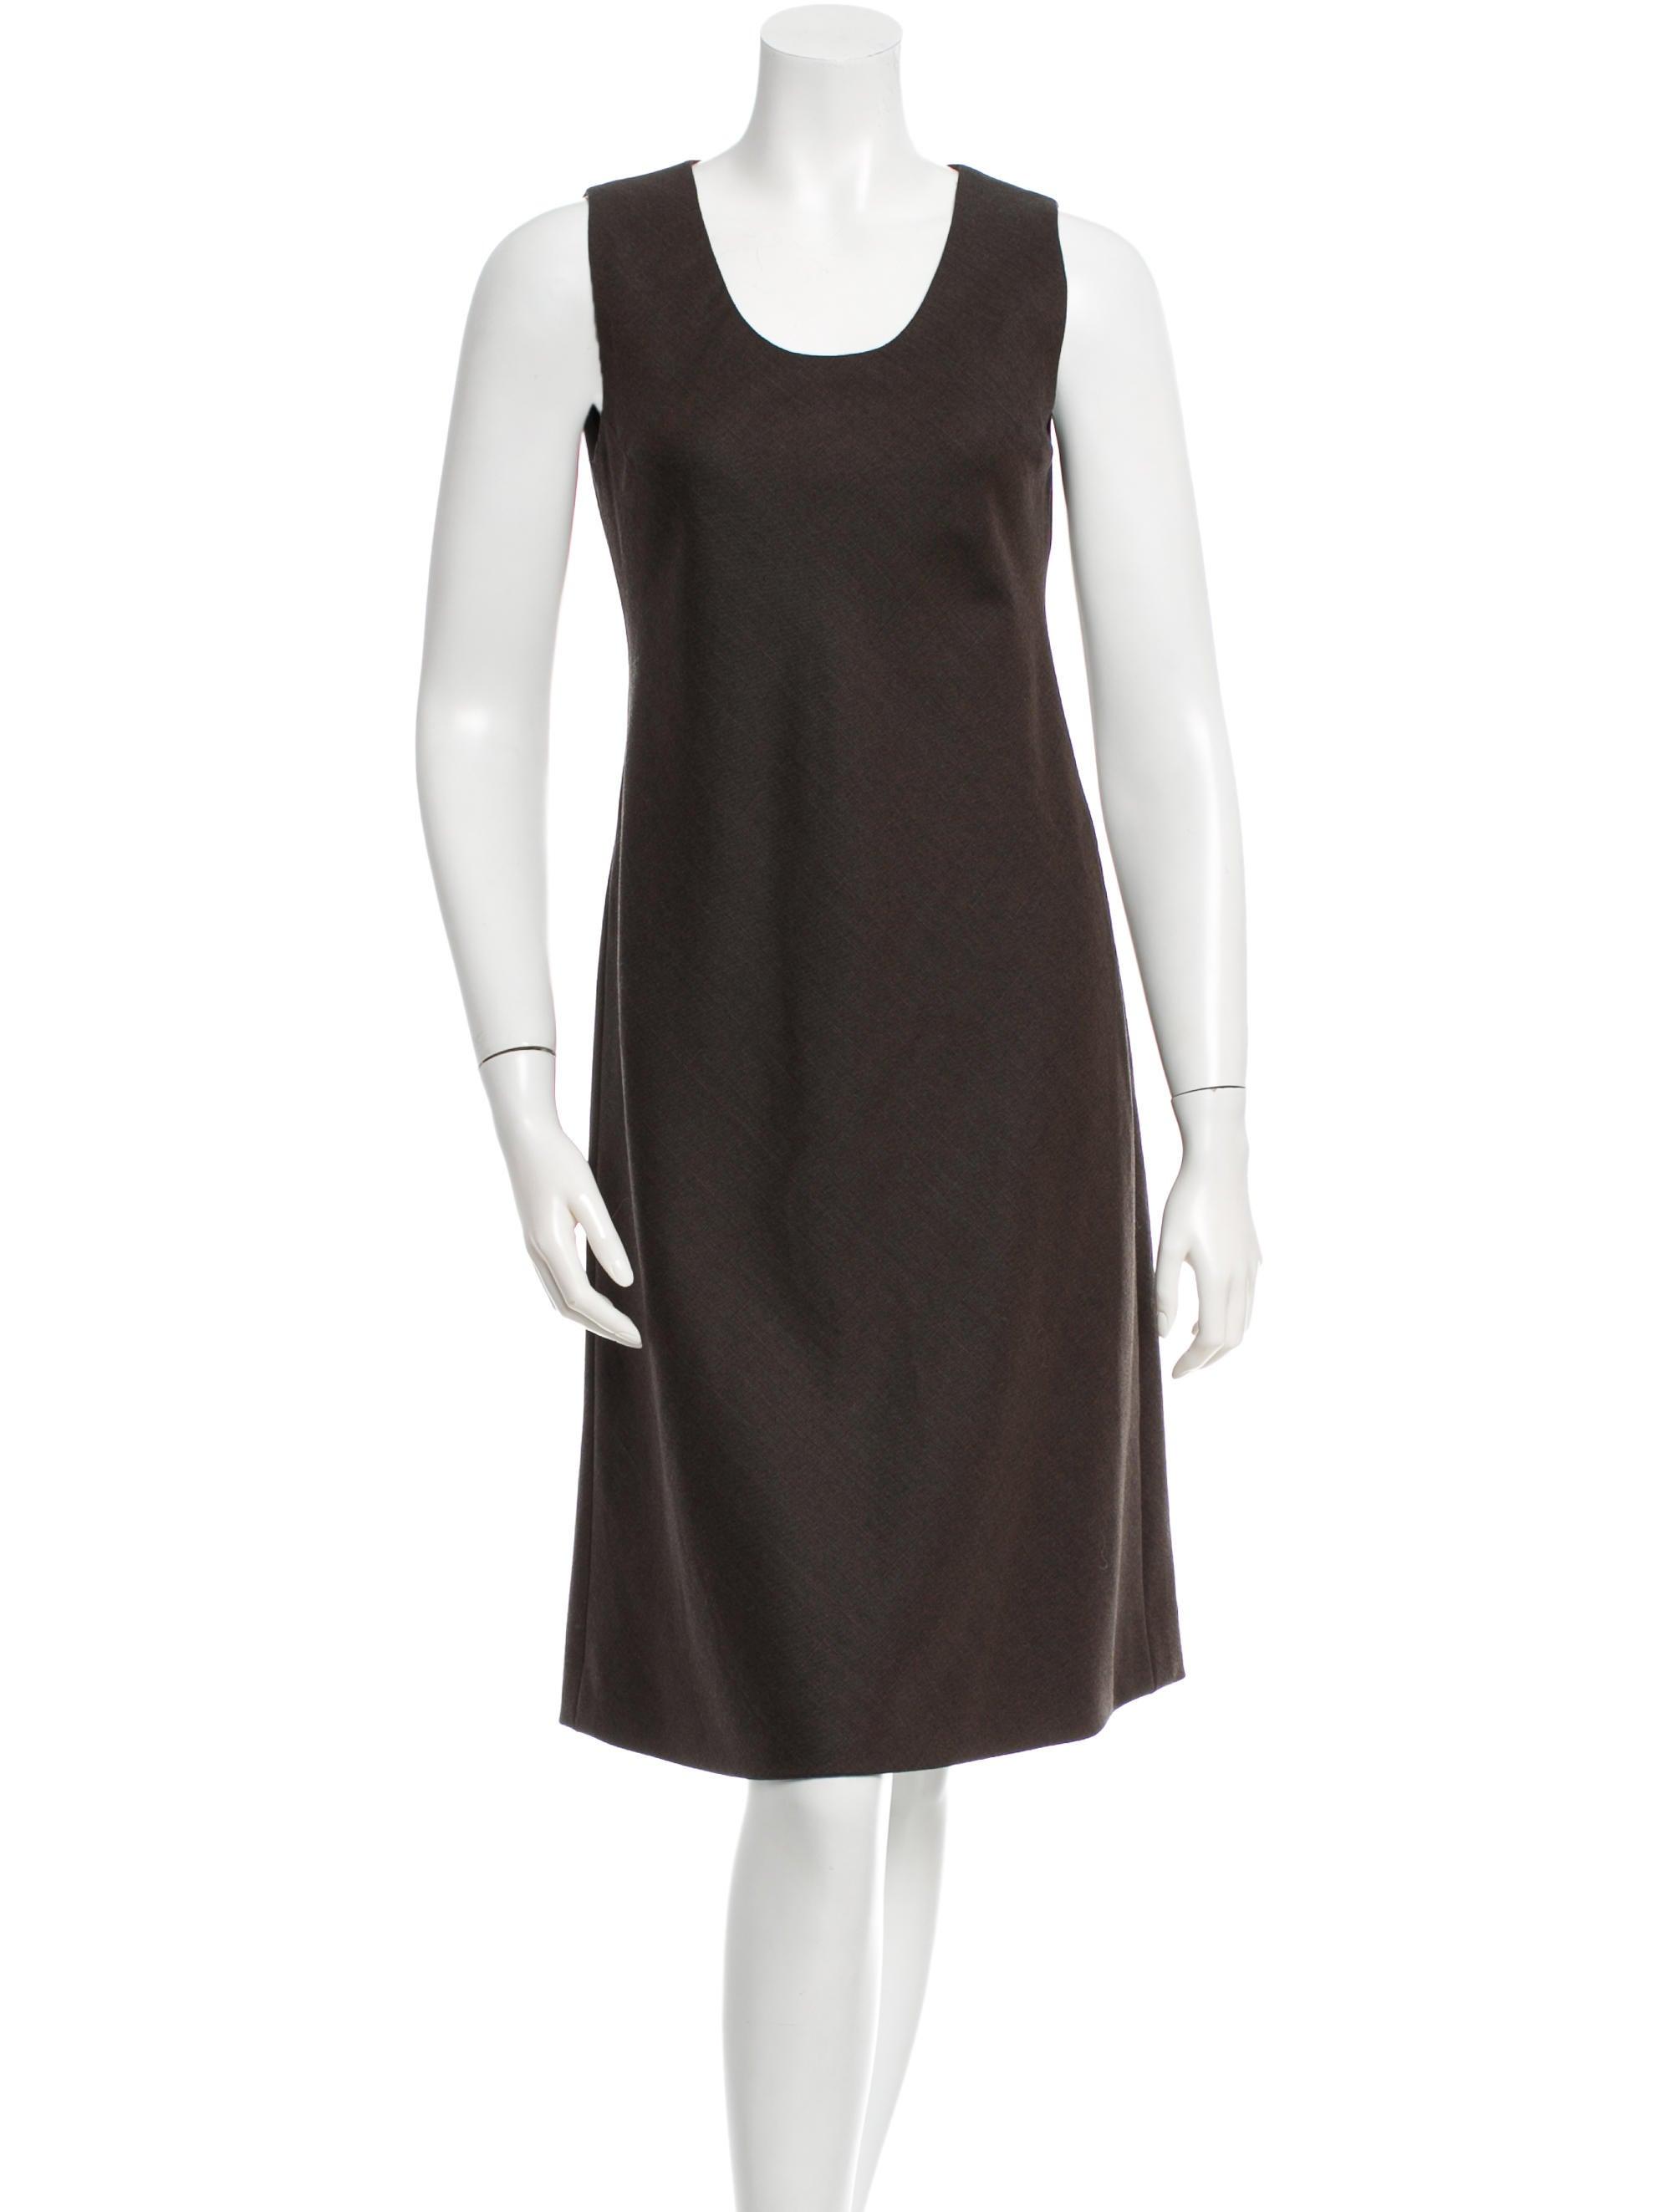 J mendel brown check dress set clothing jme22044 for Ladies brown check shirt